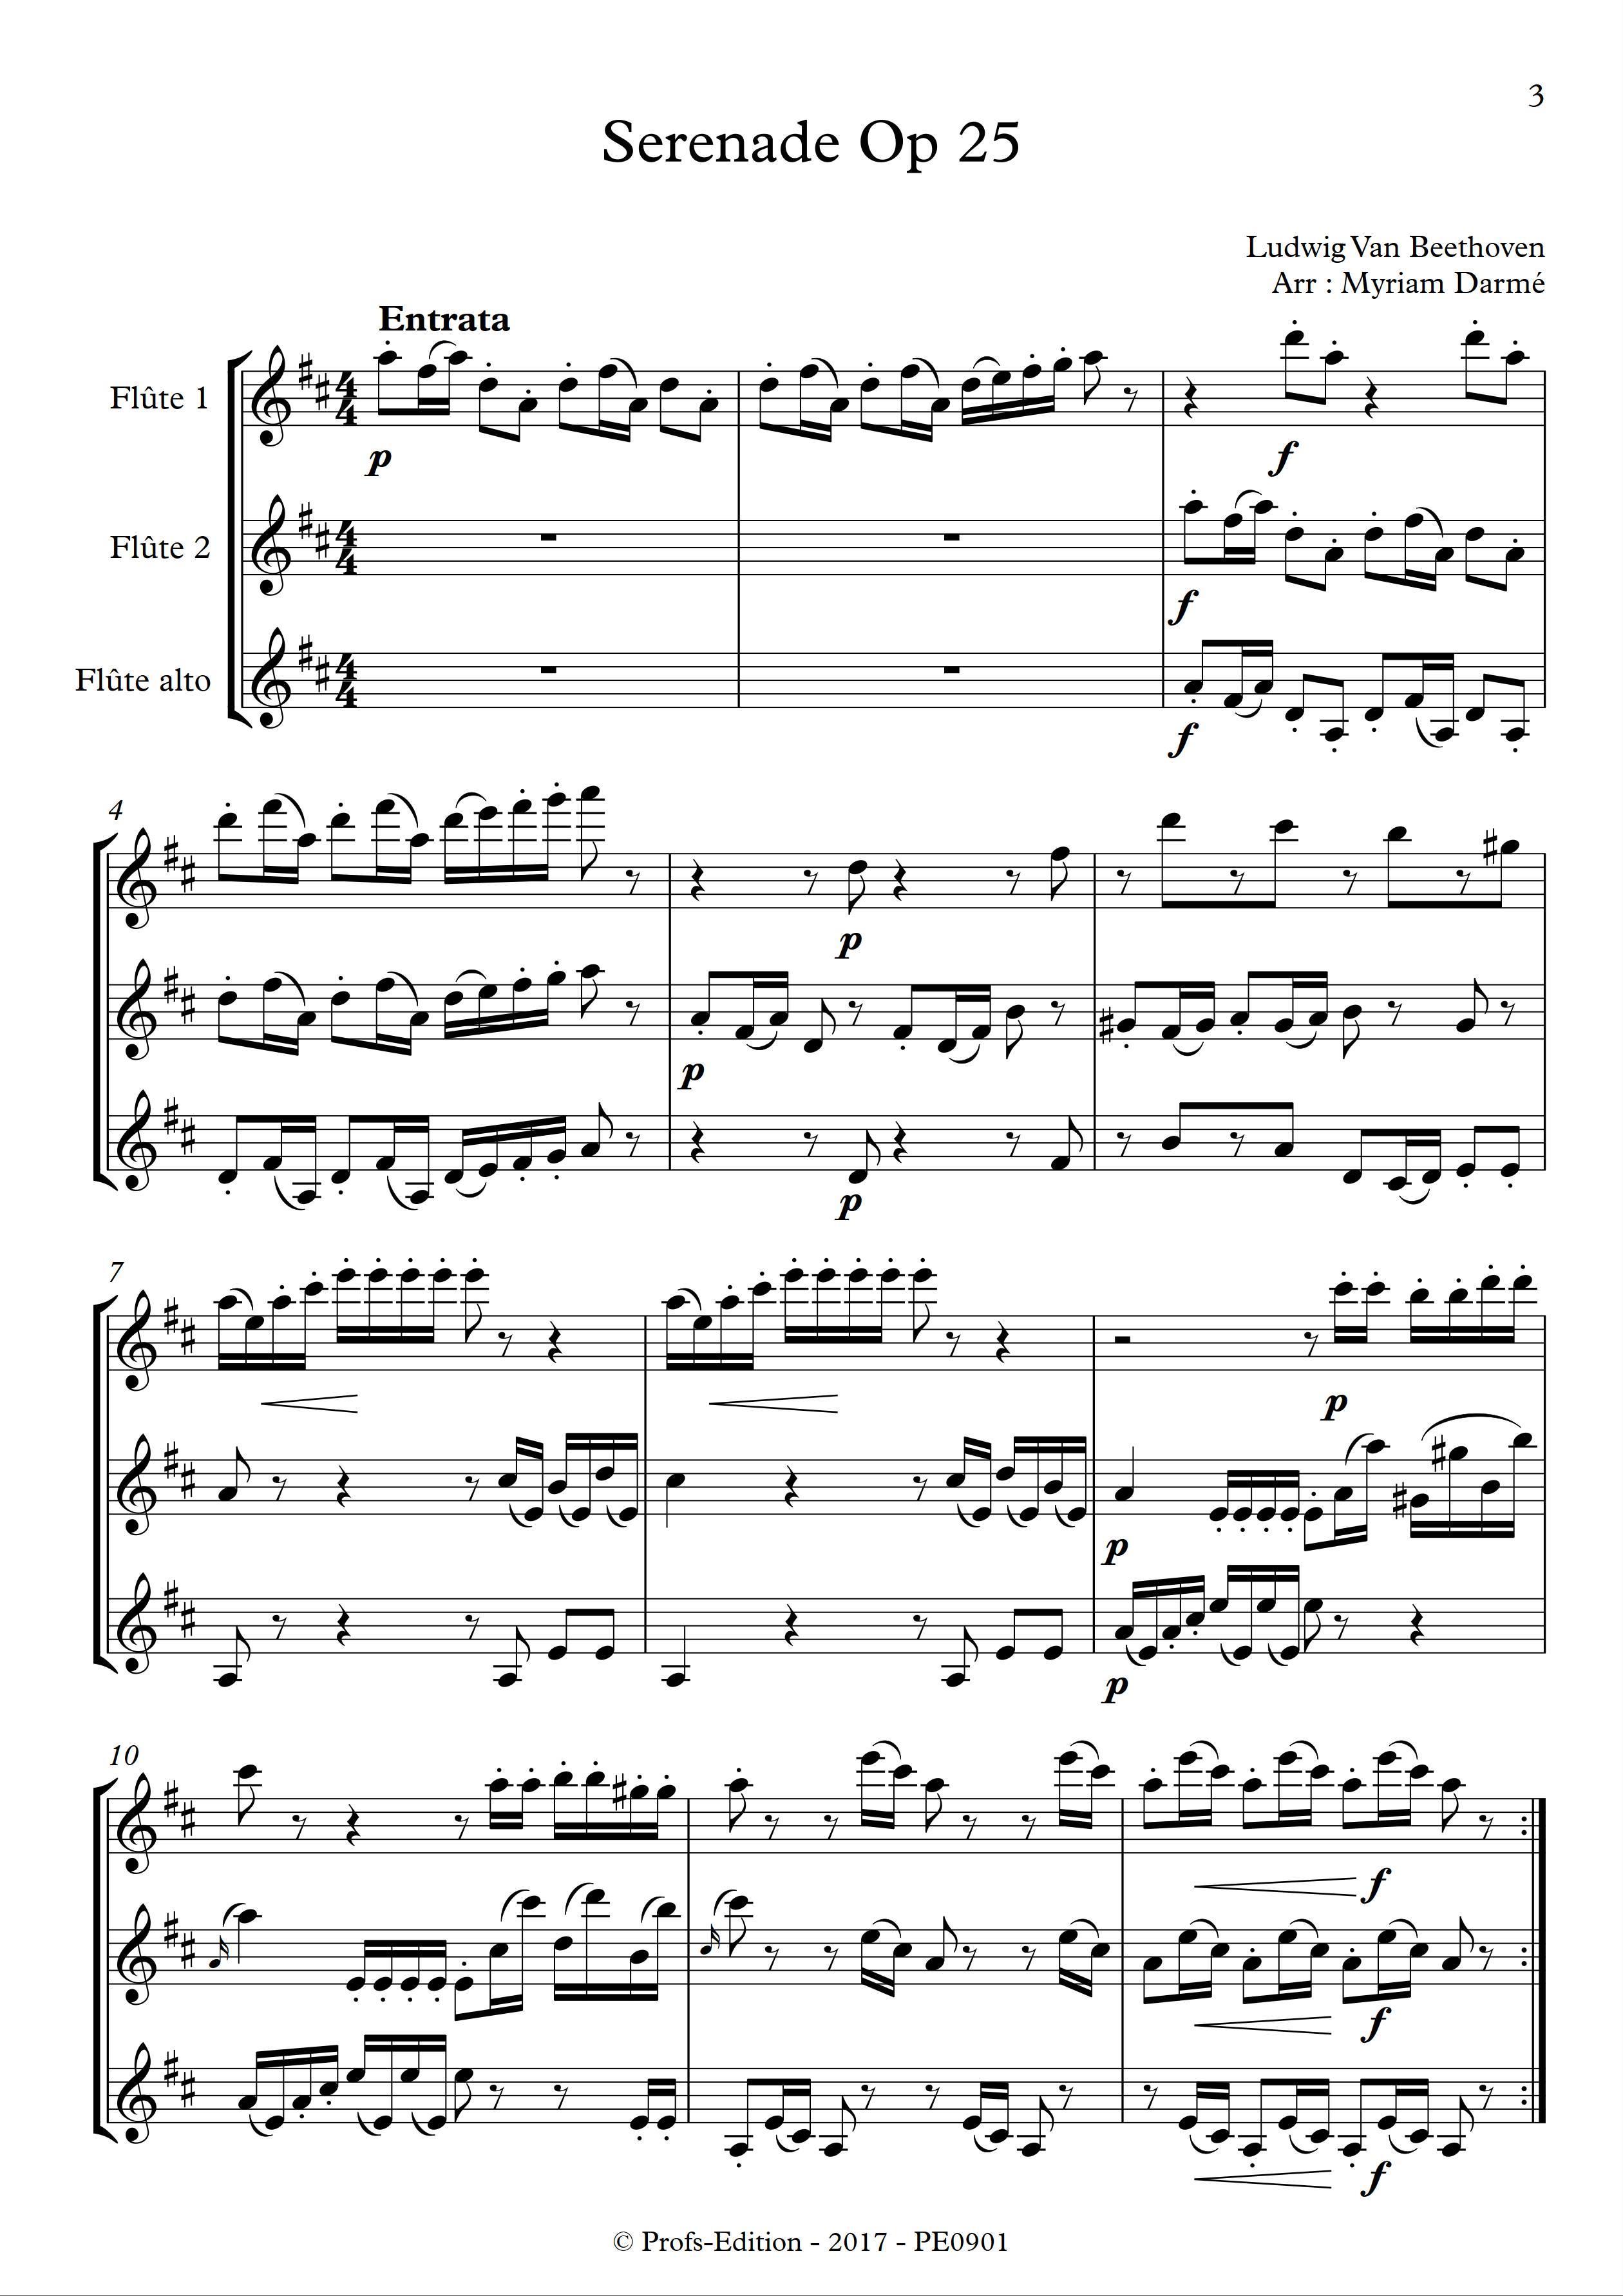 Serenade Op 25 - Trio de Flûtes - BEETHOVEN L. V. - Partition